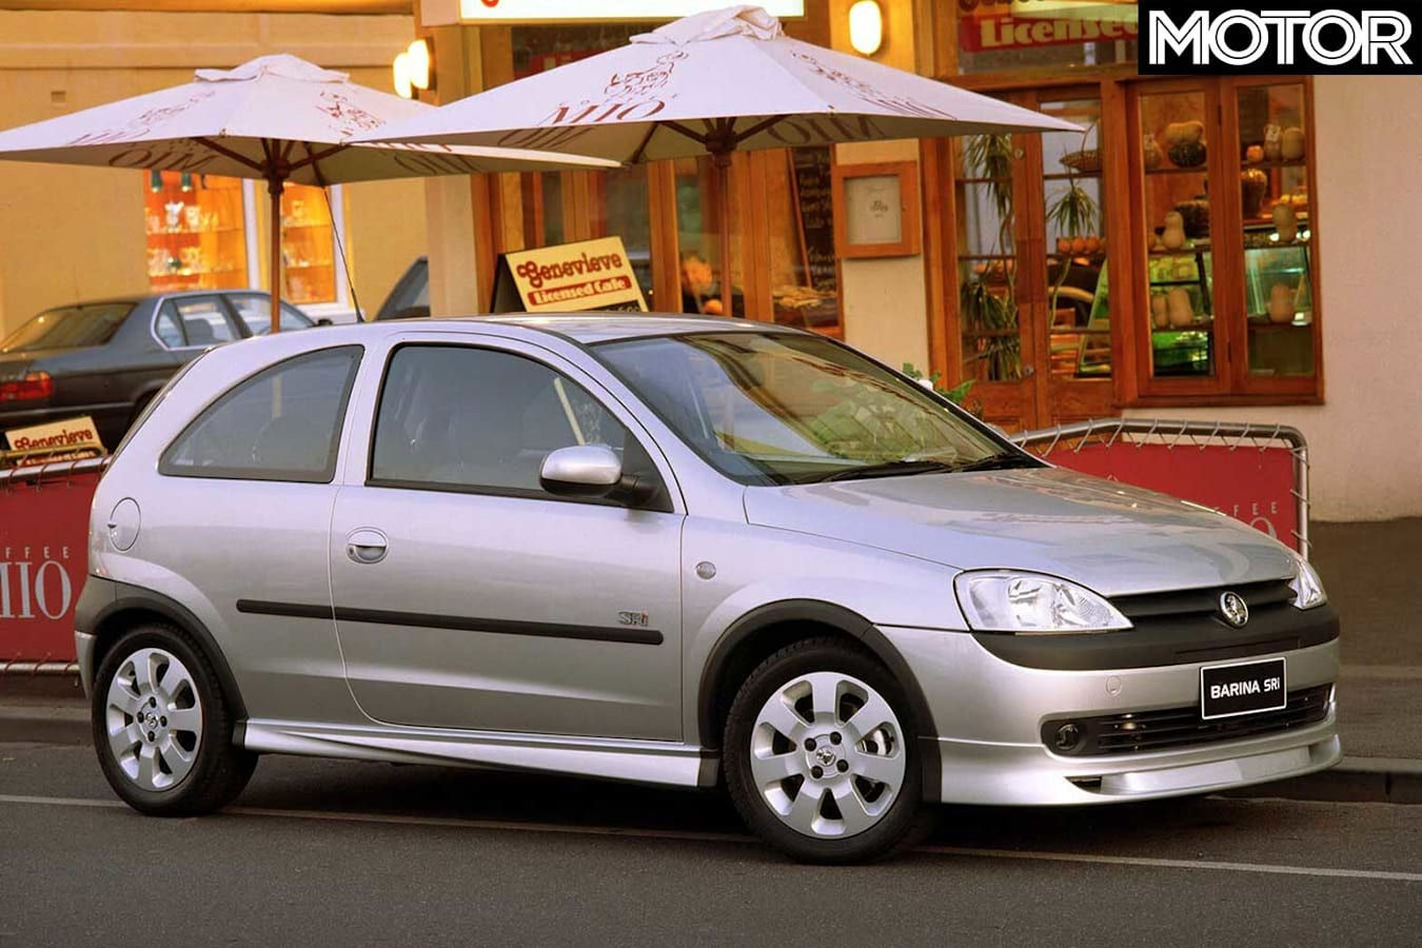 2001 Holden Barina S Ri Front Static Jpg